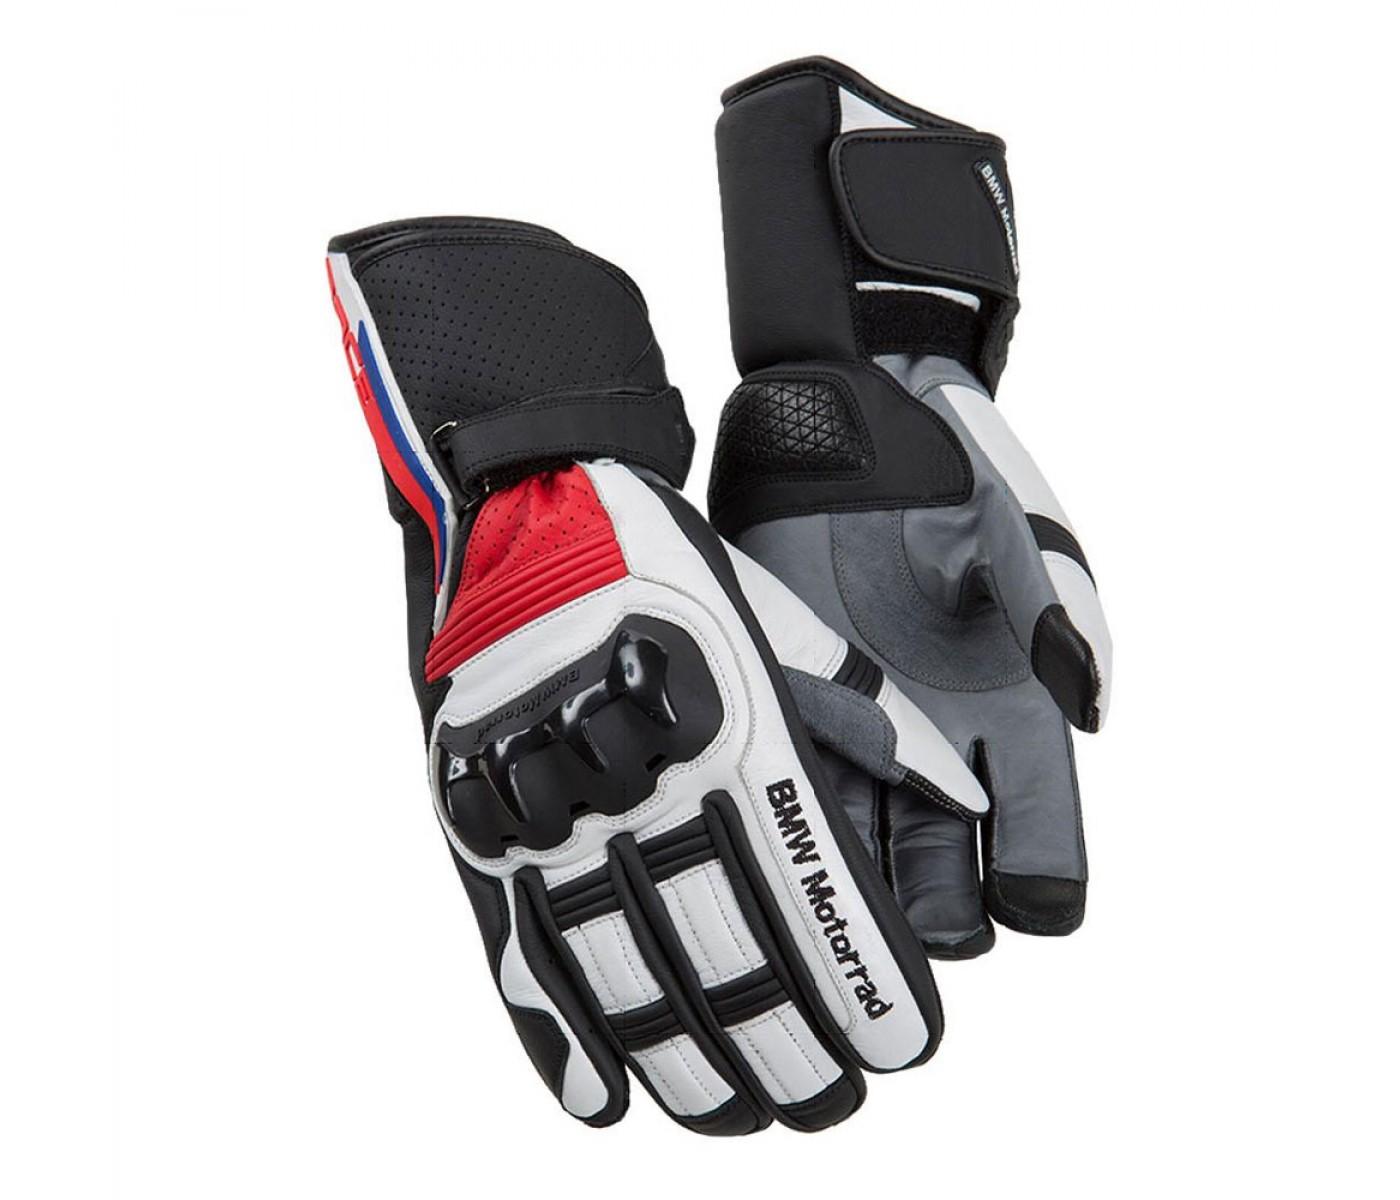 e1810b171c -8% BMW Motorrad Γάντια Δερμάτινα ProRace Μαύρο   Άσπρο   Κόκκινο ΕΝΔΥΣΗ